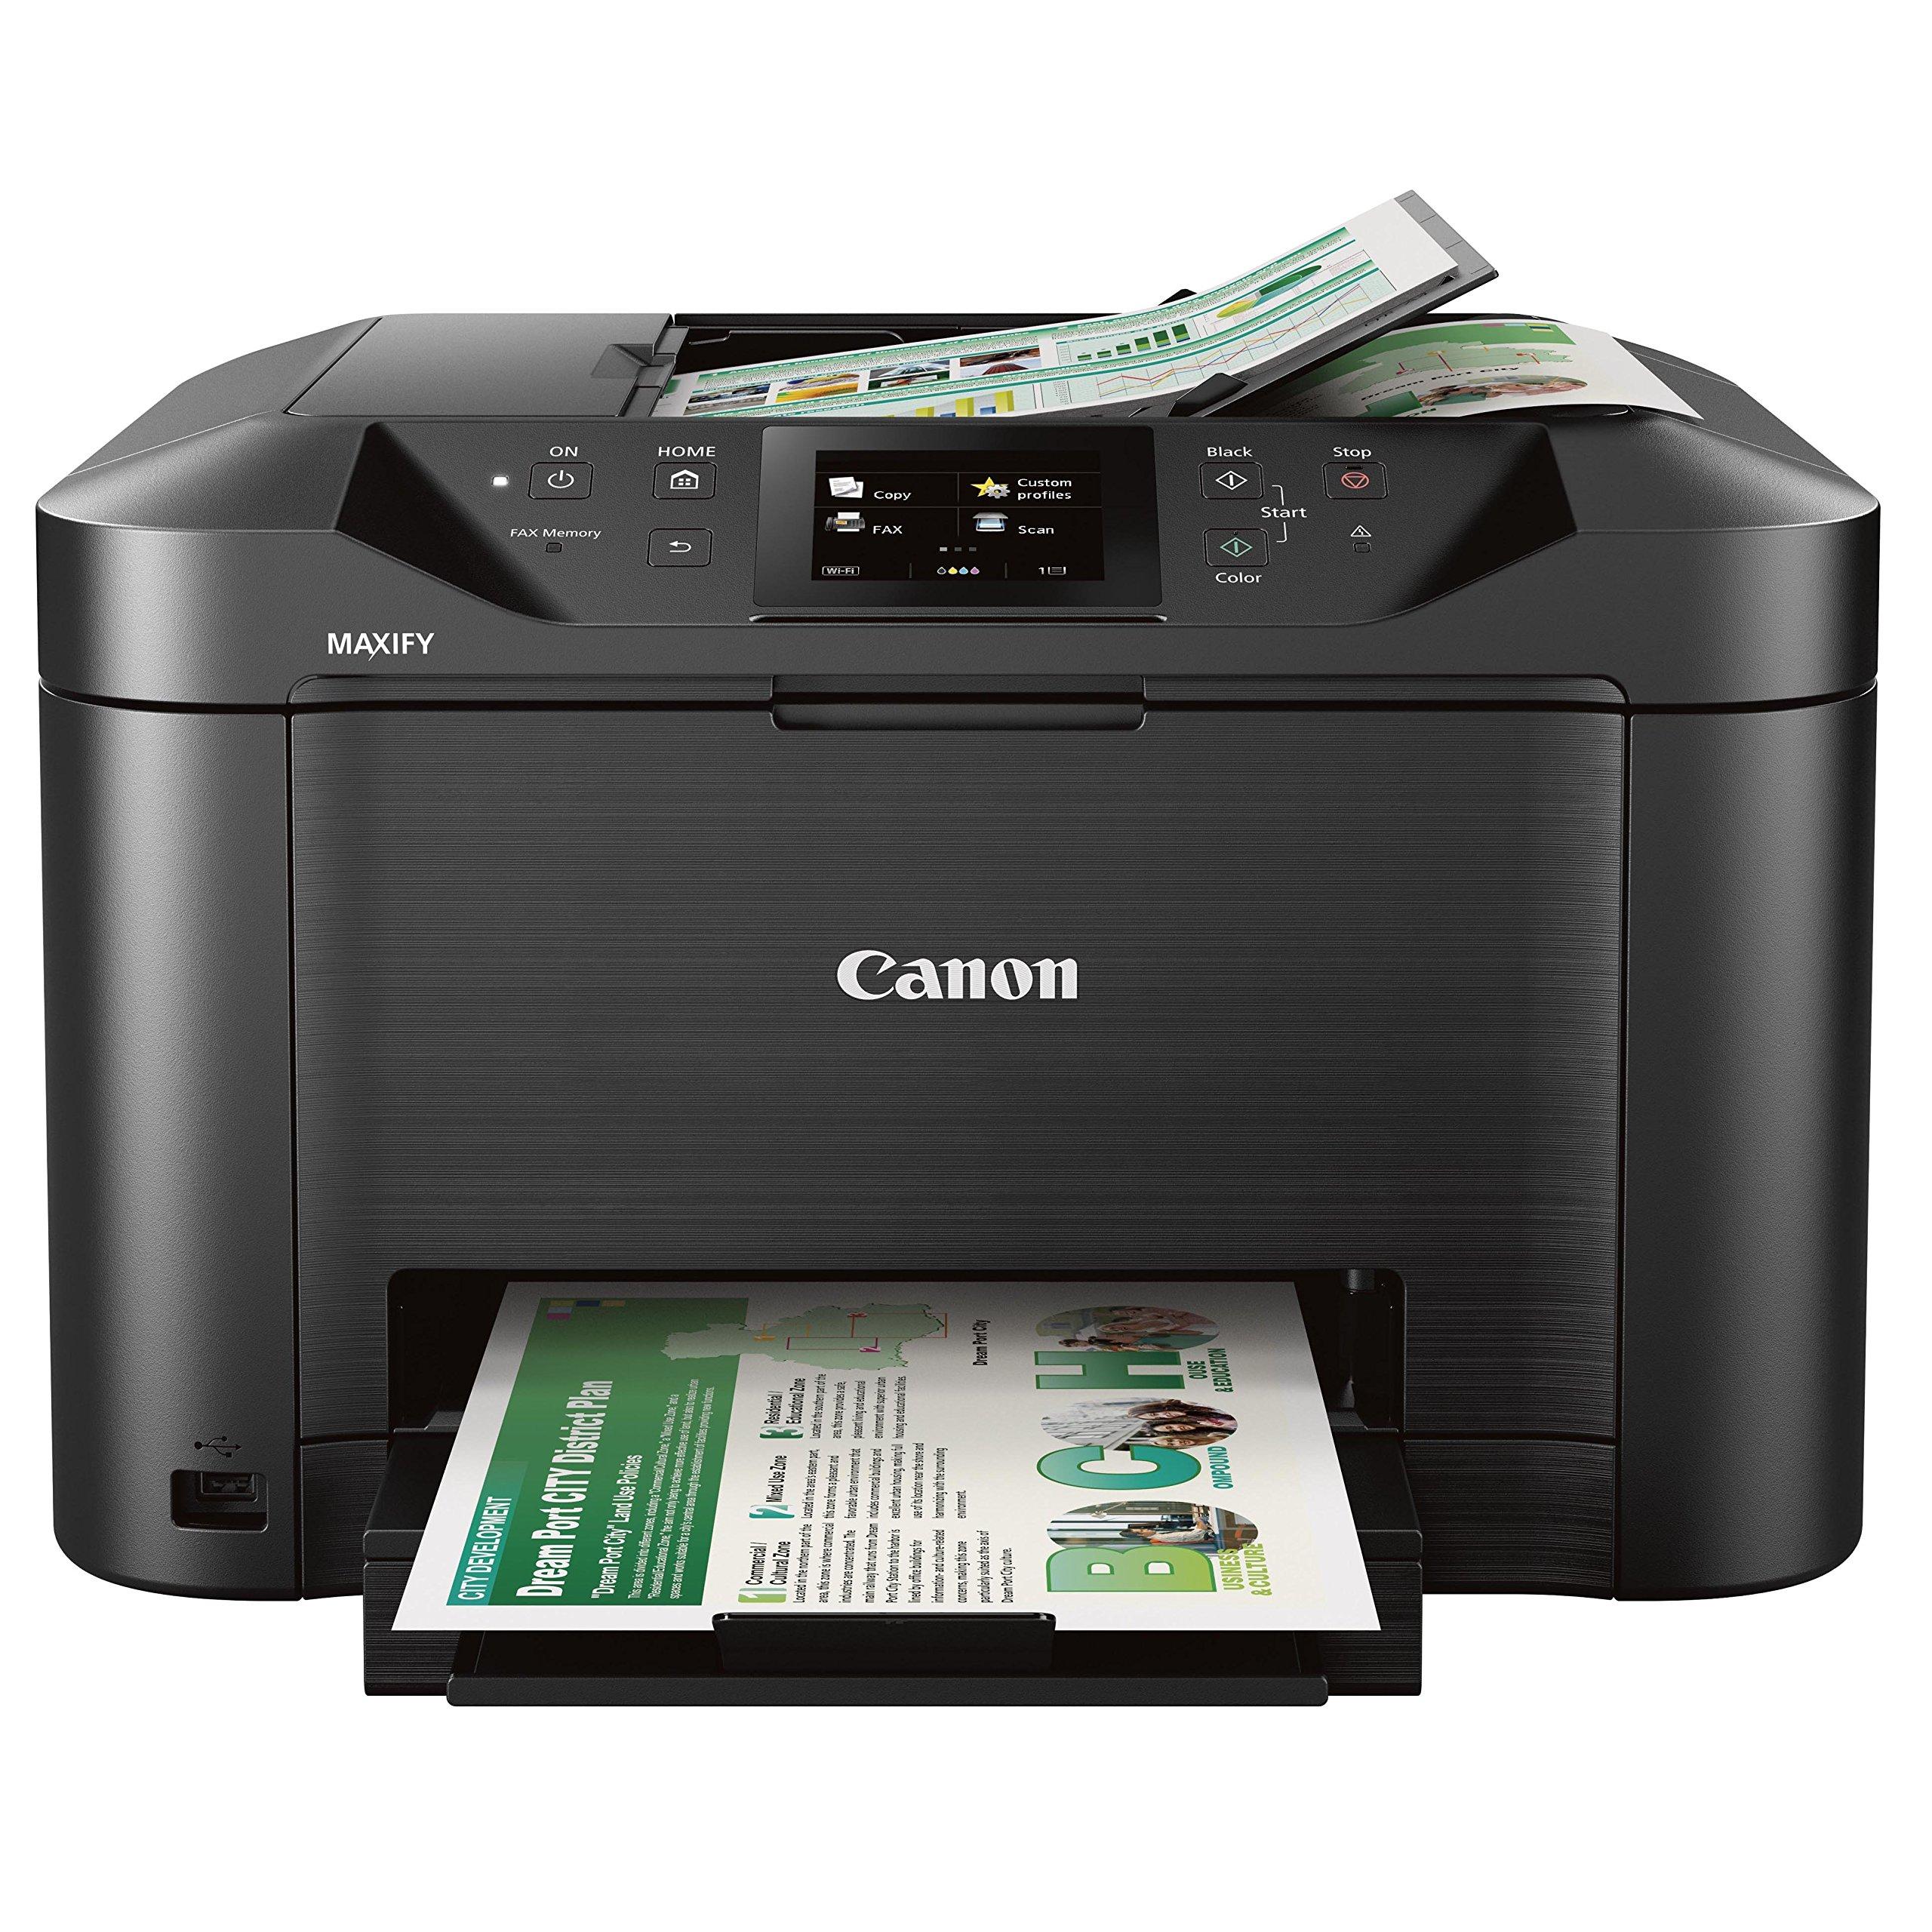 Canon Business MB5120 Printer Printing